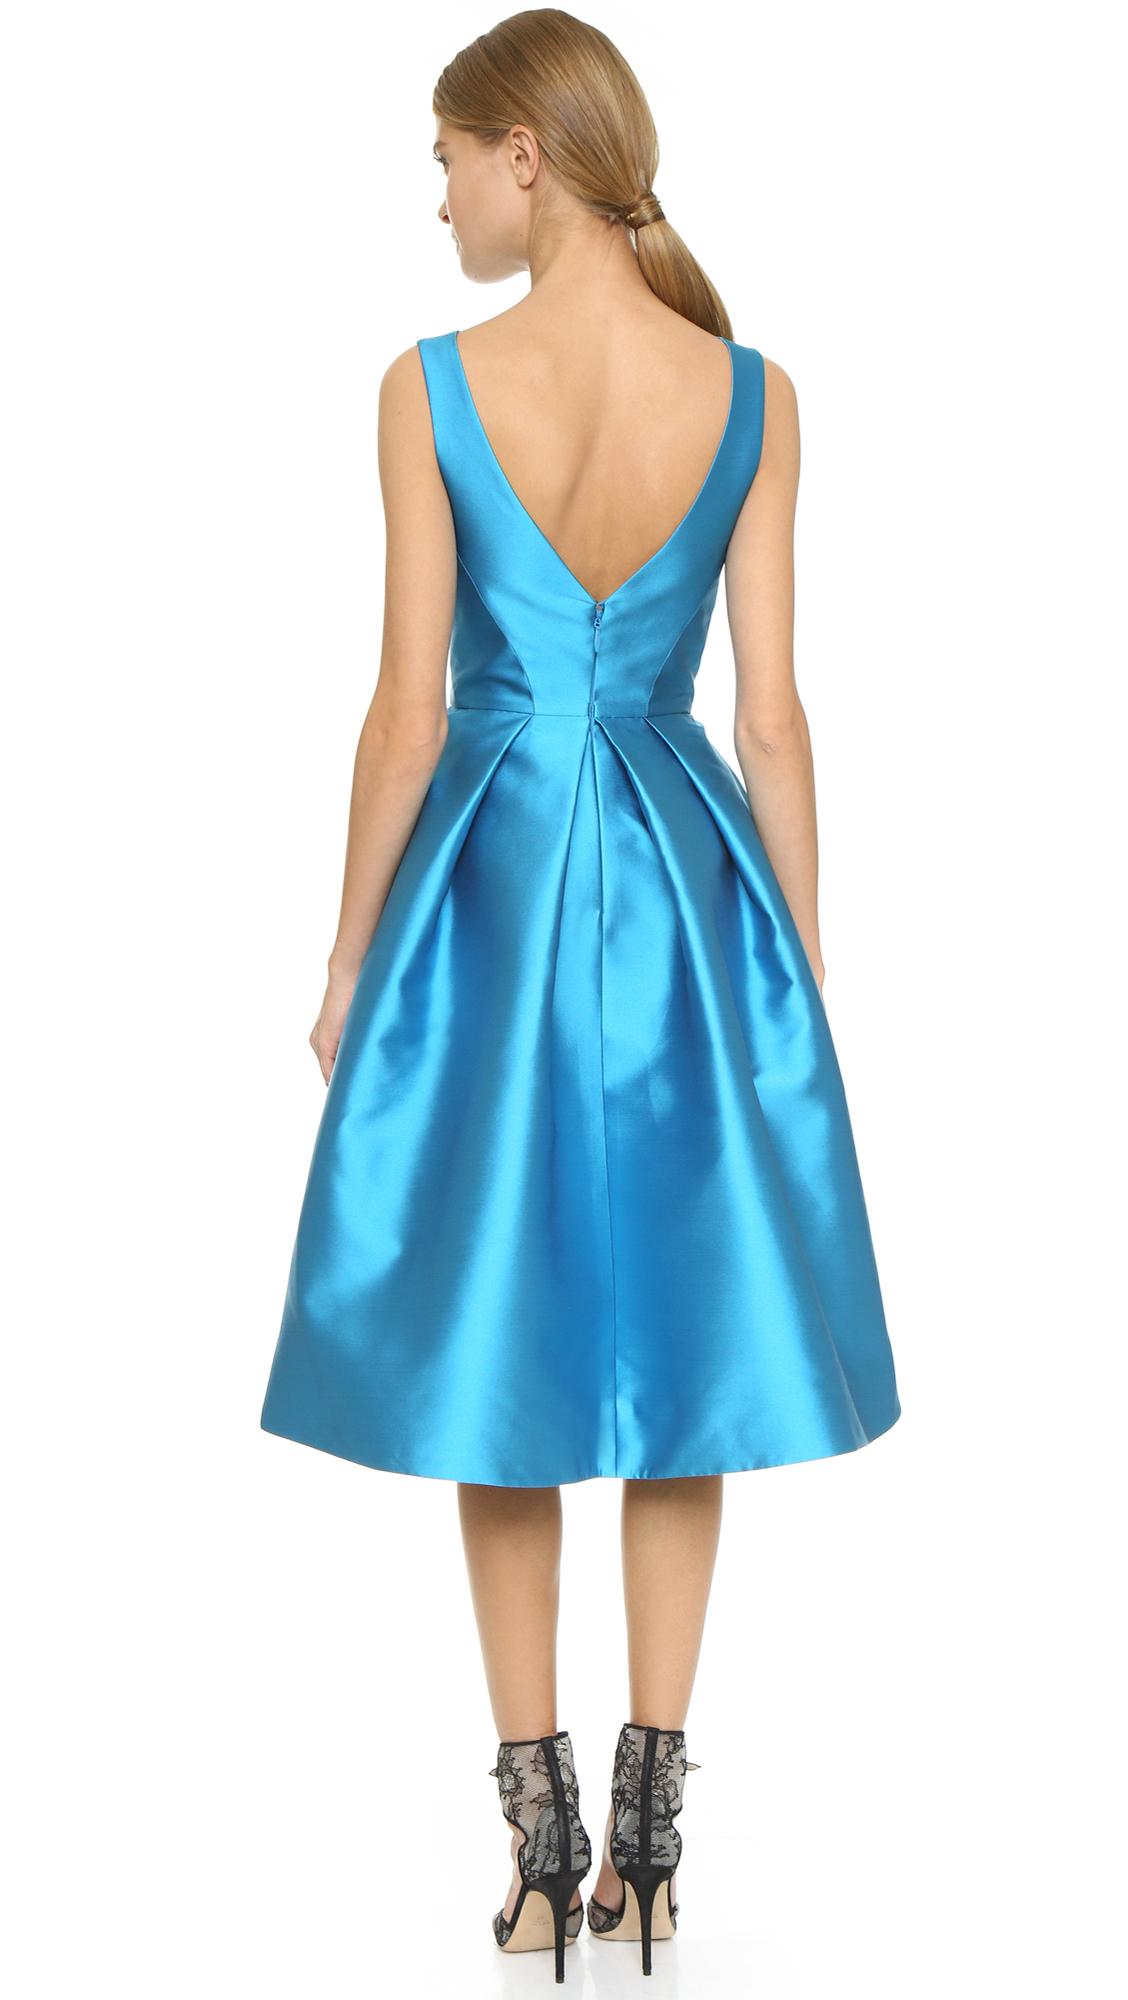 Lyst - Monique Lhuillier Structured Sleeveless Dress in Blue